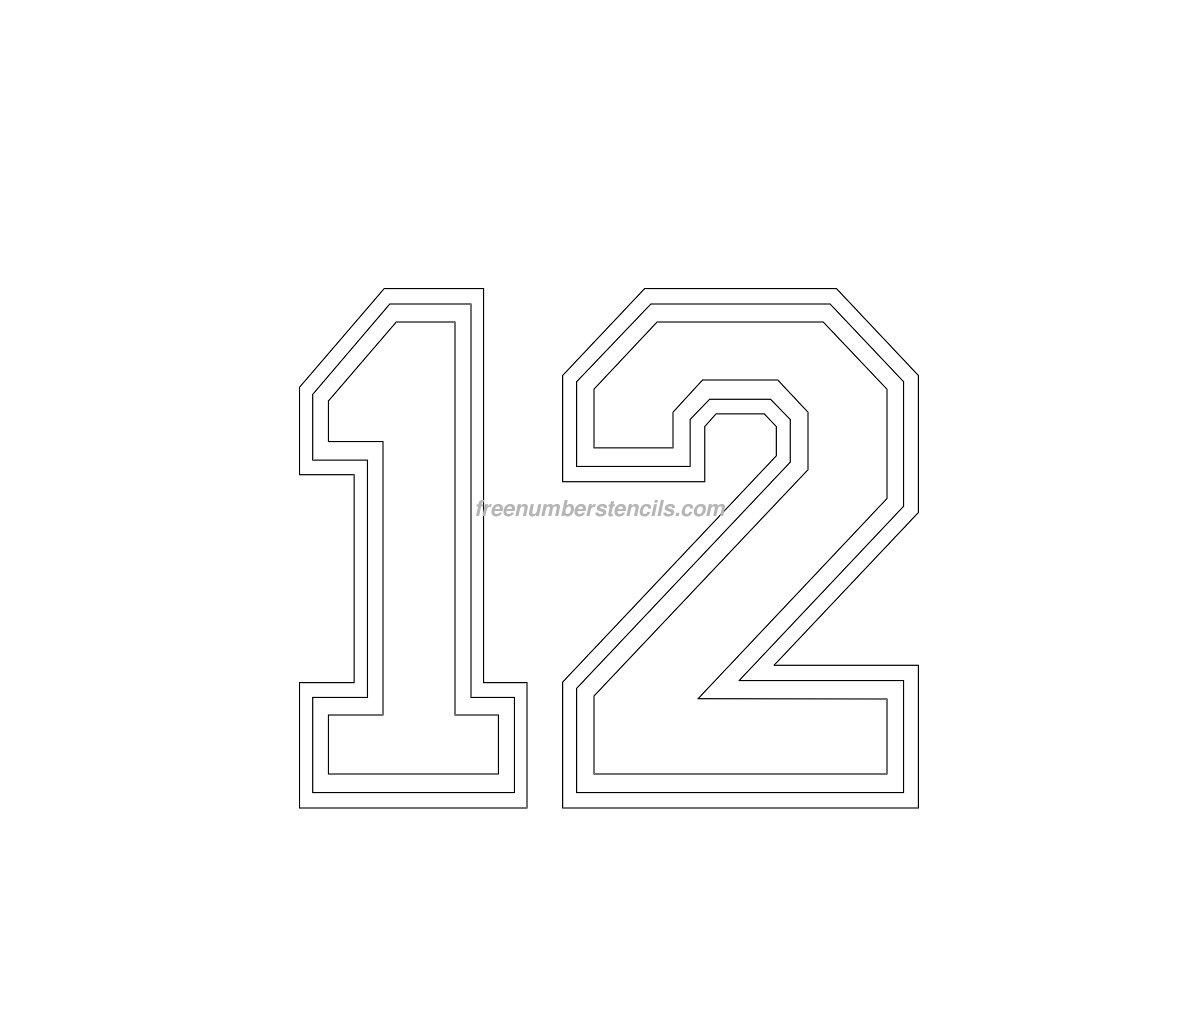 free varsity 12 number stencil